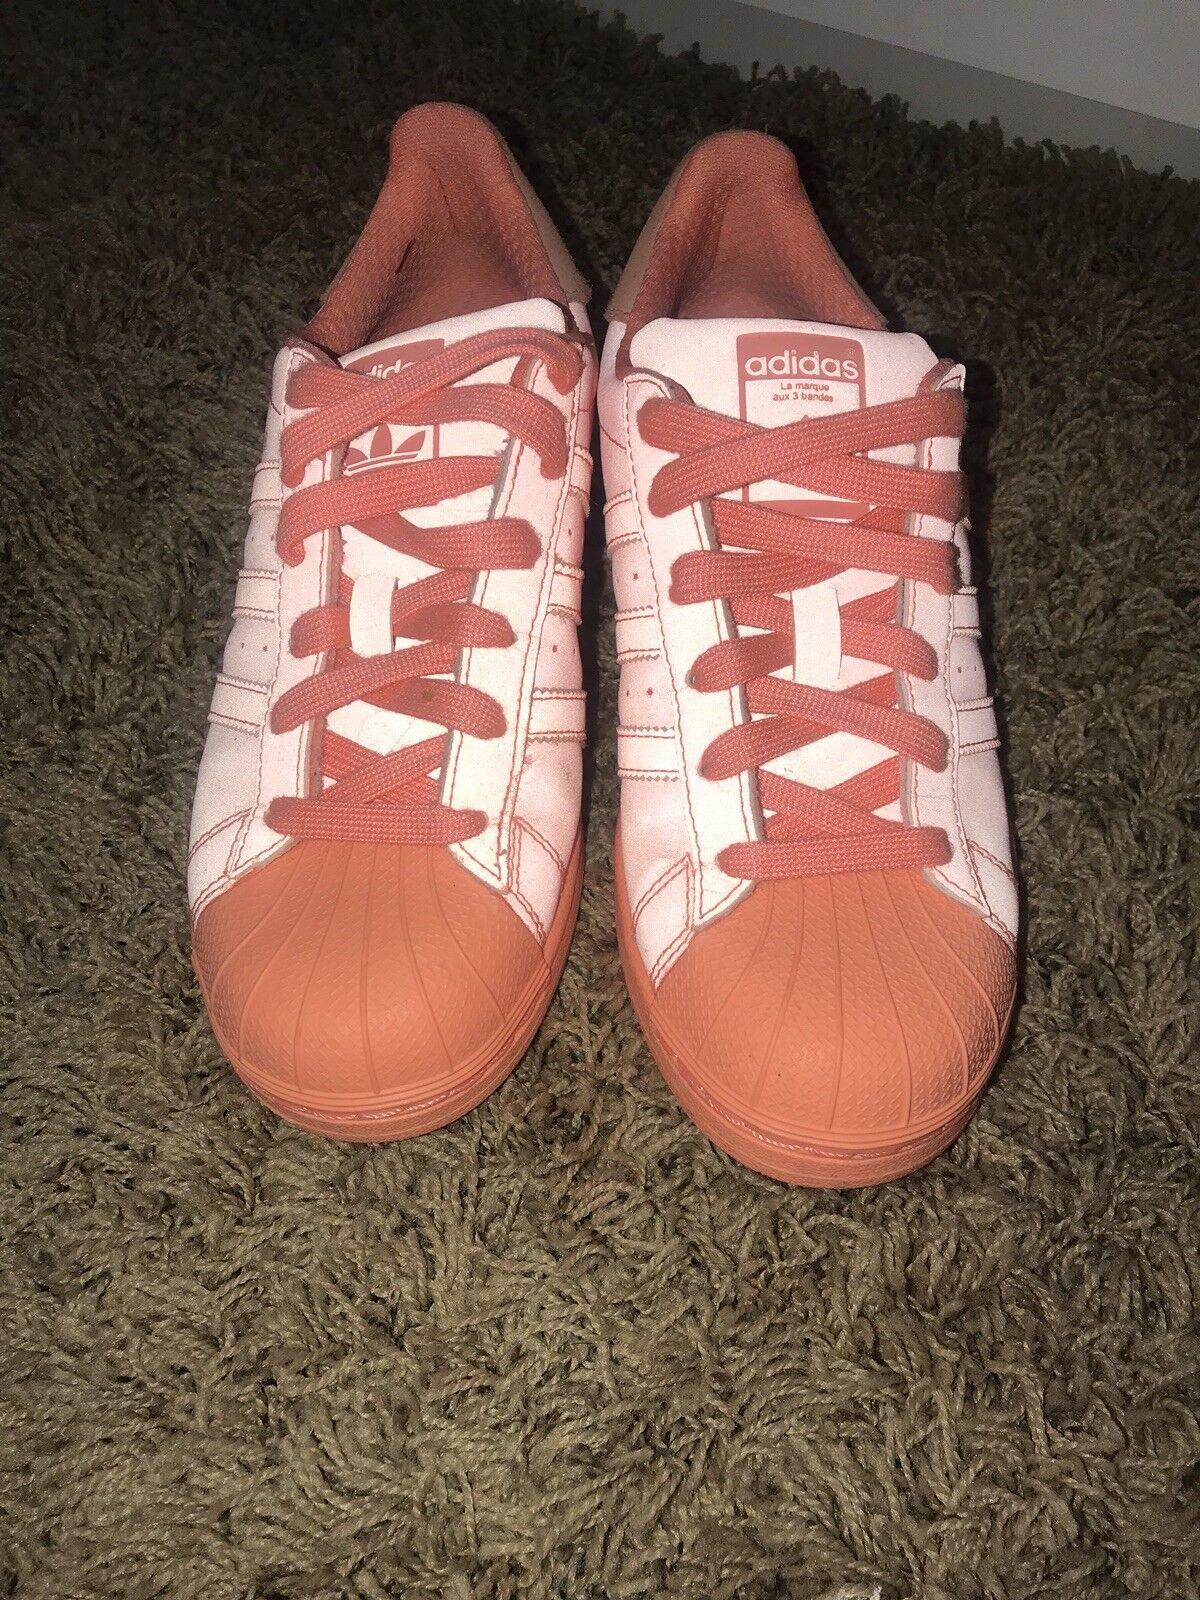 Adidas superstar riflettente peach scarpe scarpe scarpe mens s80330 scarpe shelltoe misura 4,5 | Facile da usare  966a0c